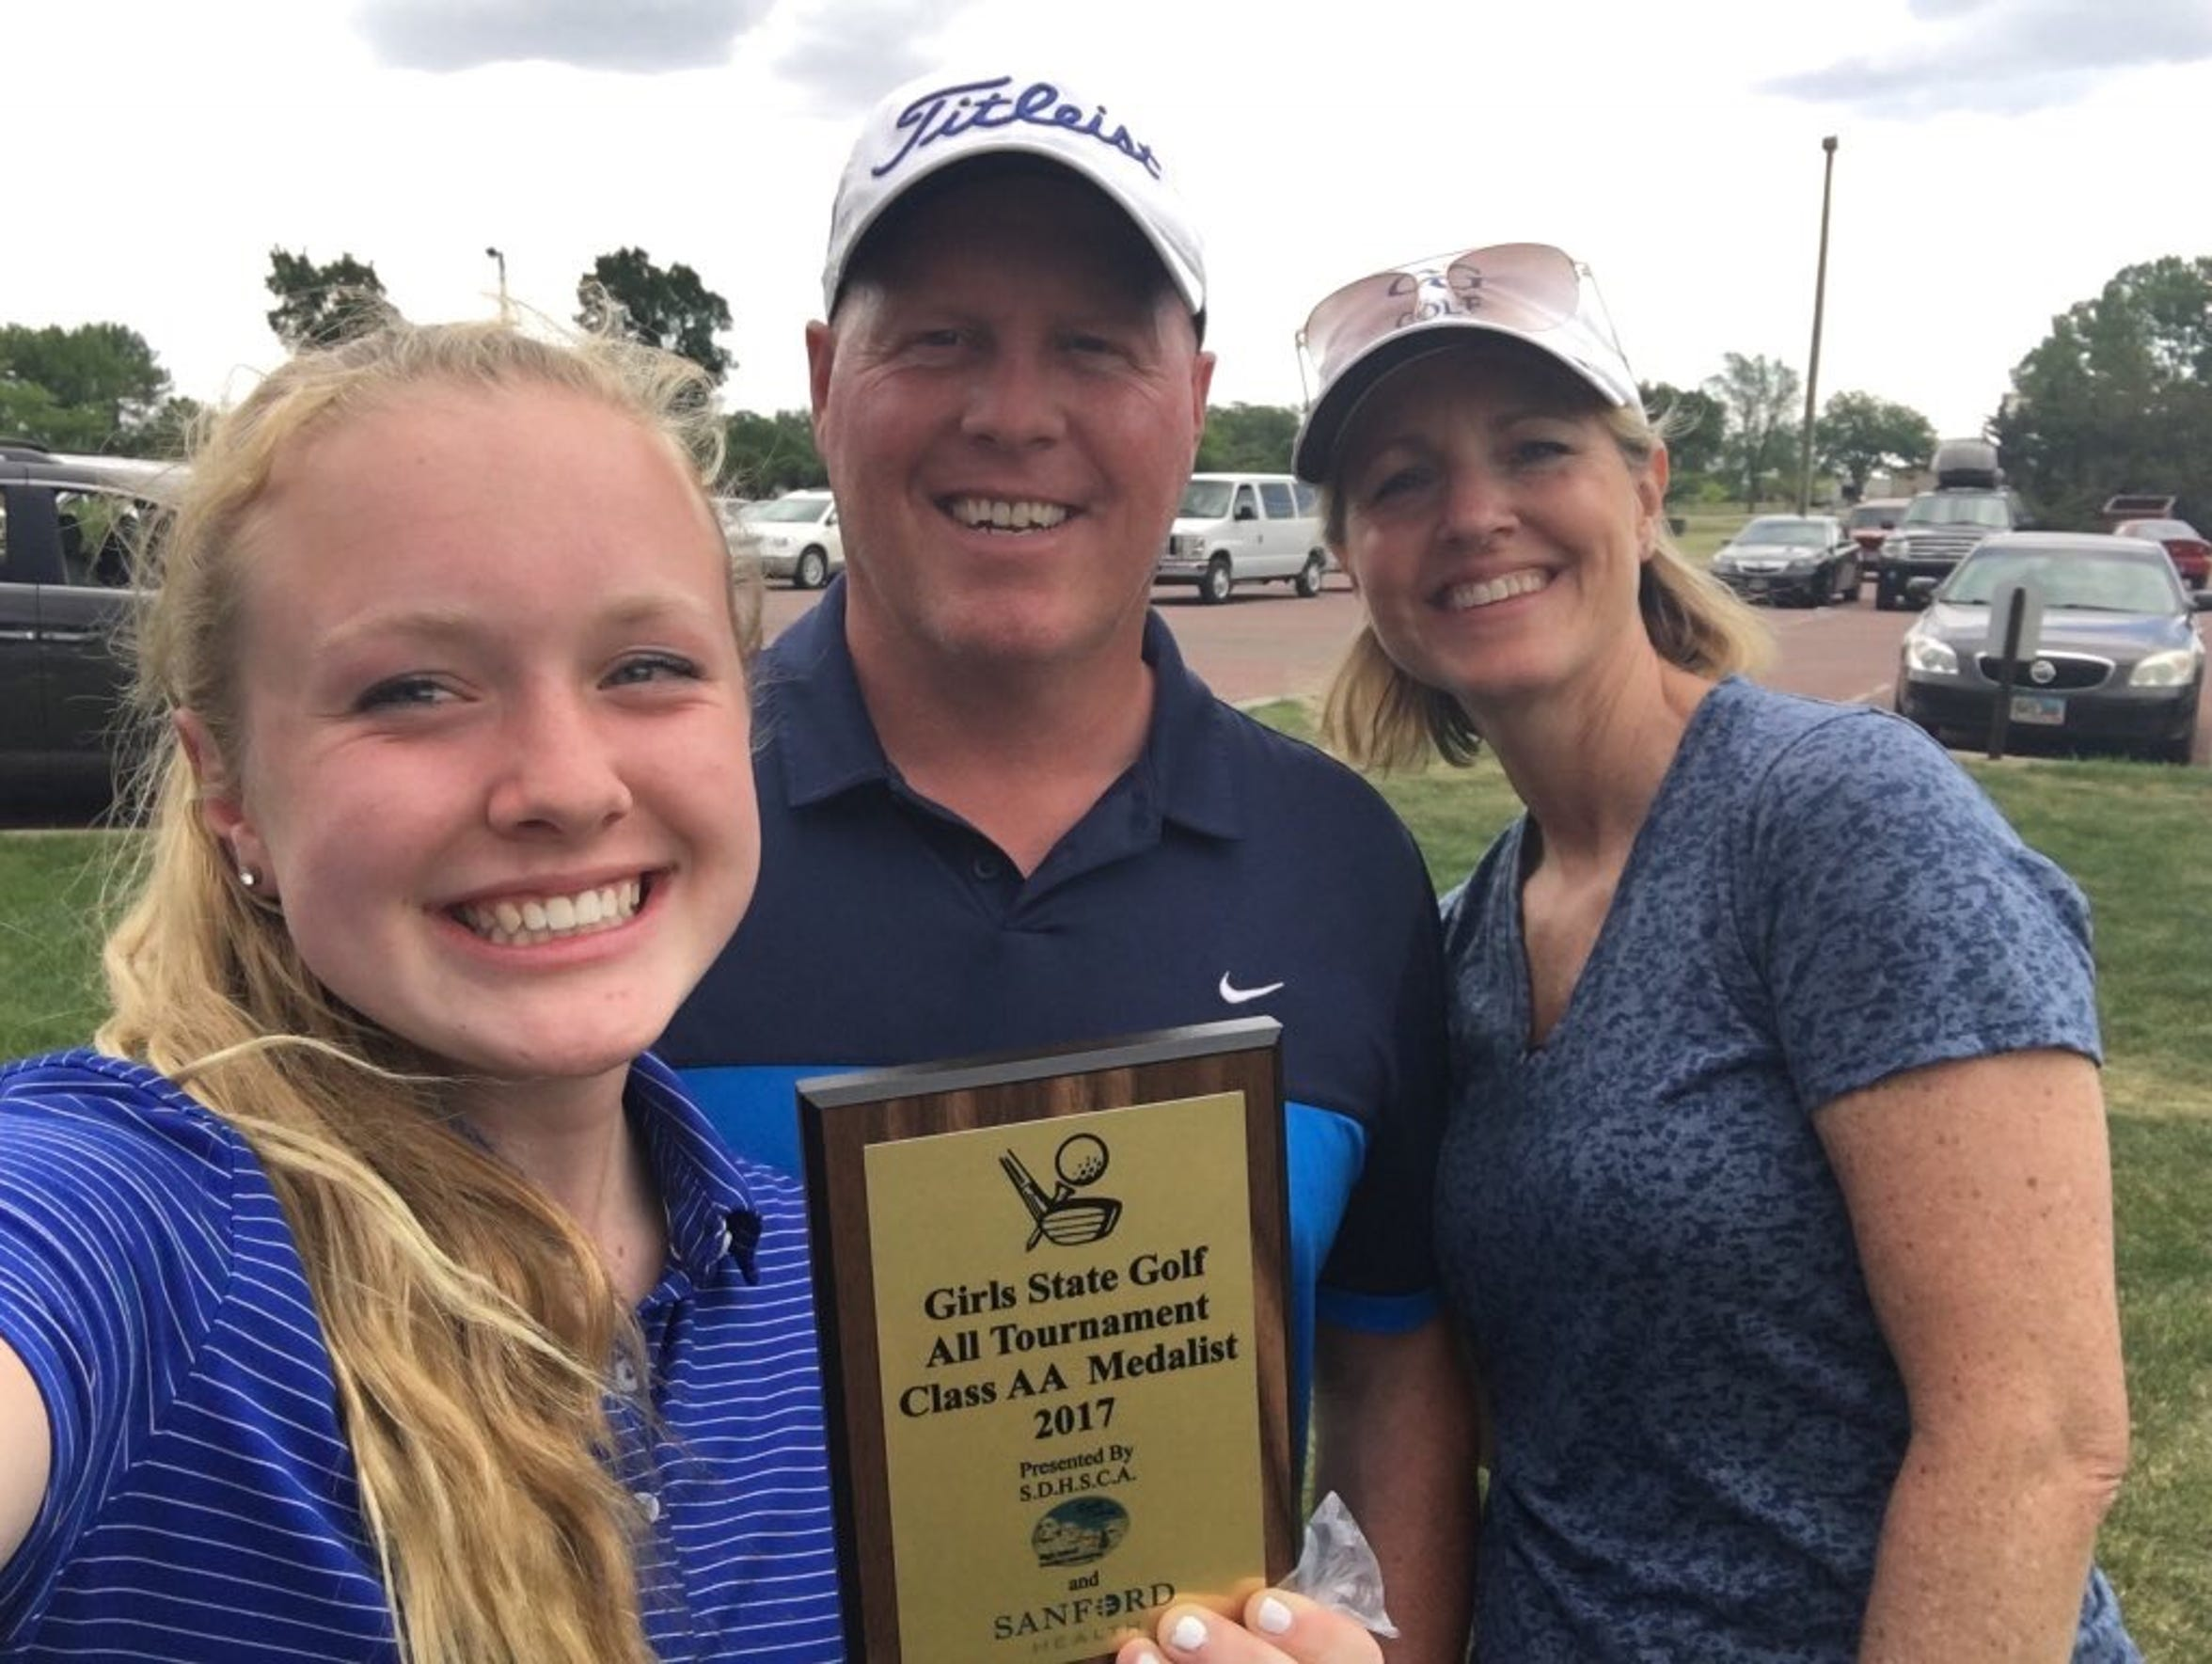 O'Gorman golfer Carly Kunkel (left) poses for photo